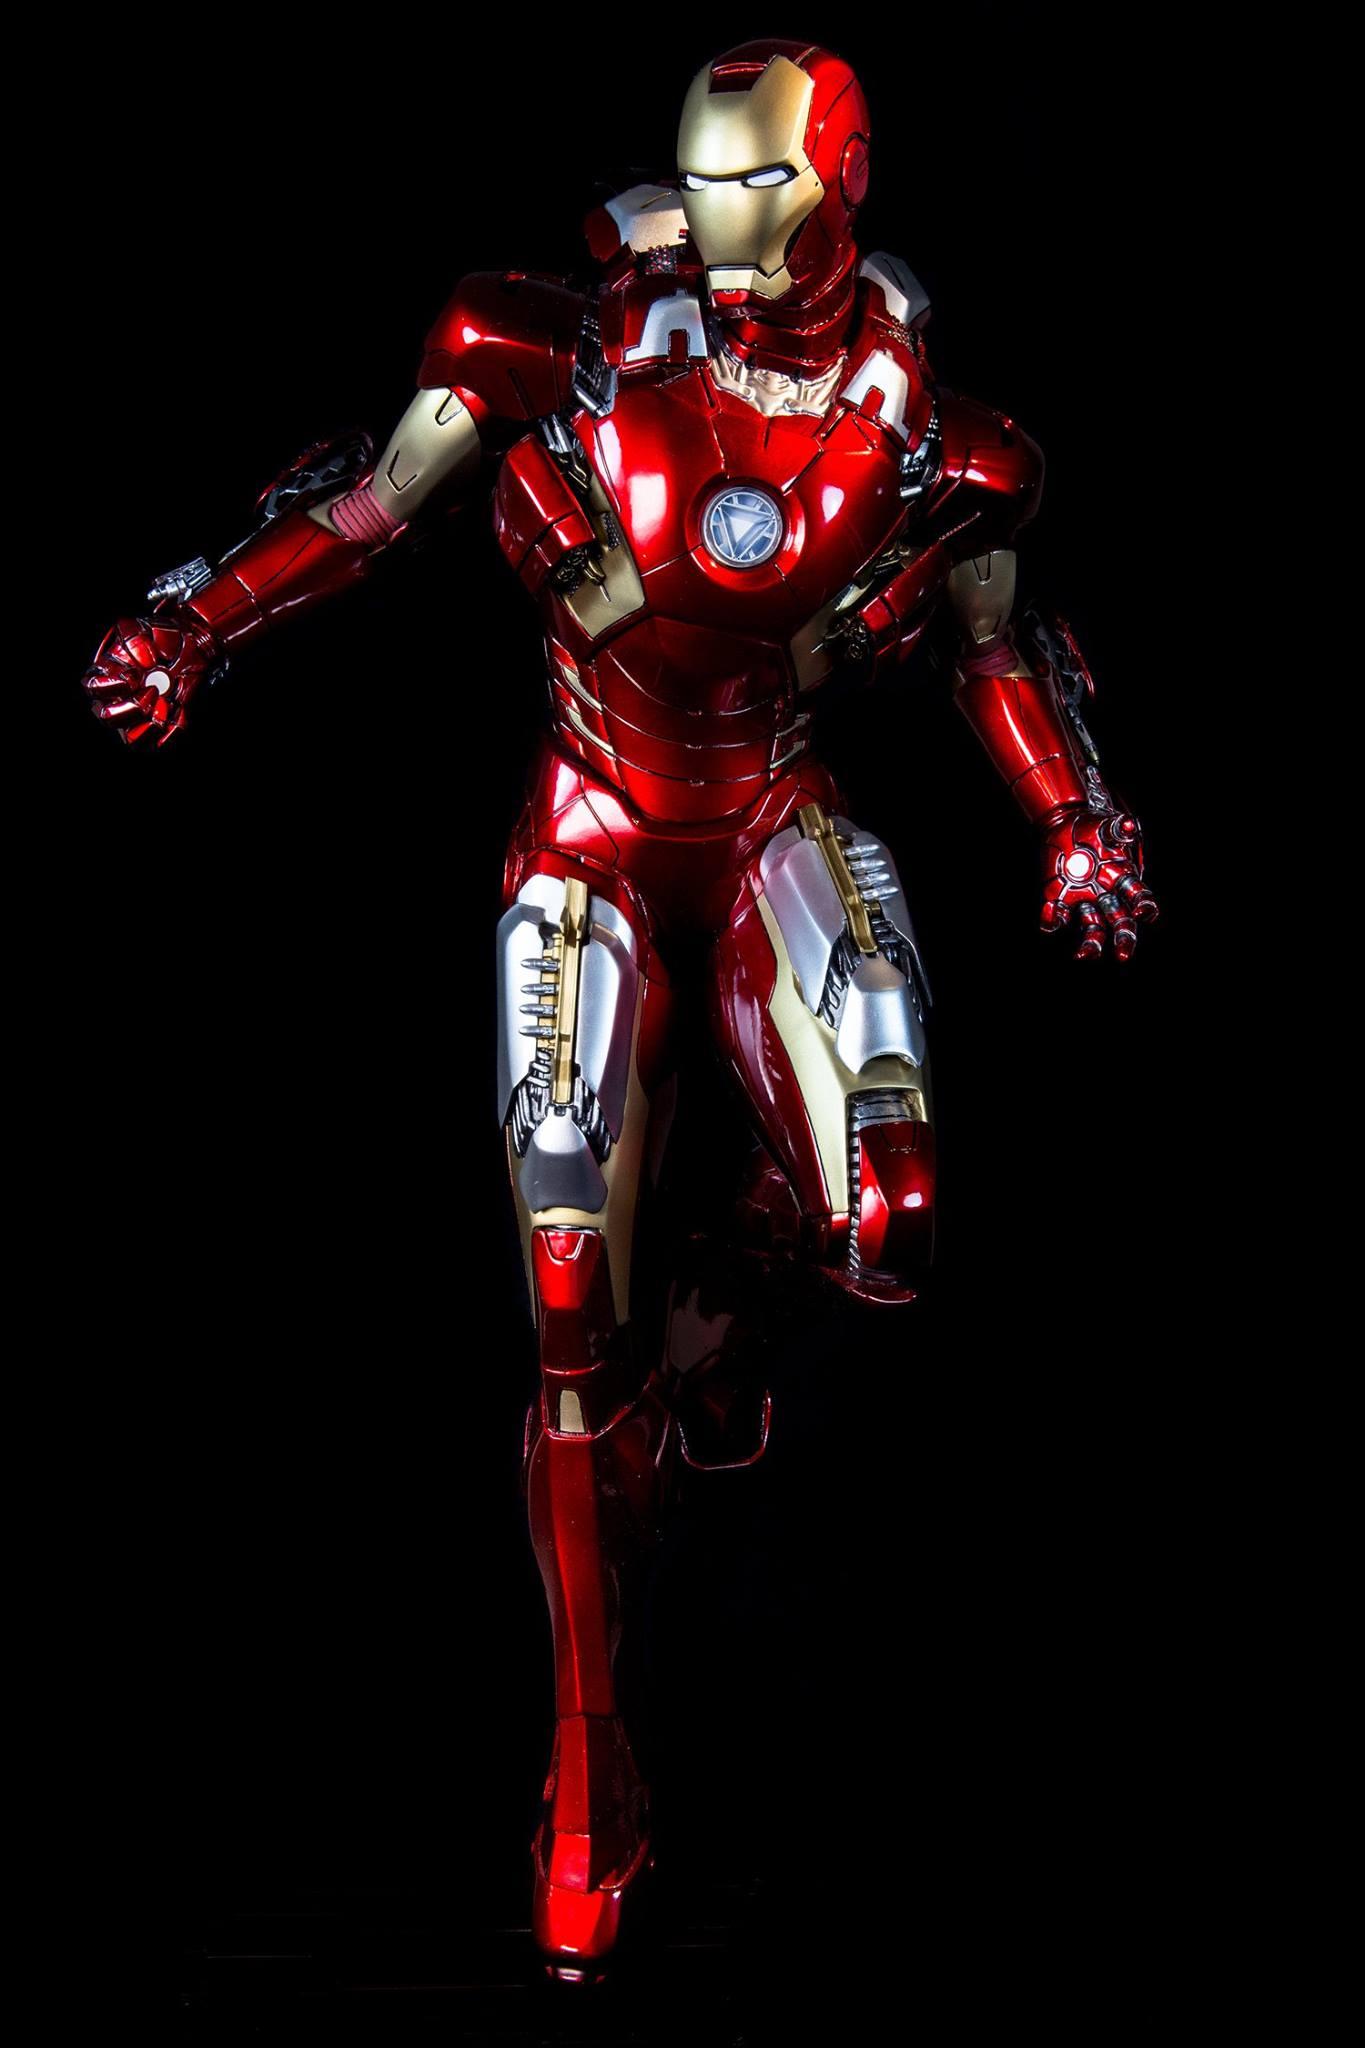 Premium Collectibles : Iron man MK VII - Page 2 6059861045010114035865465287075442360909119787924o